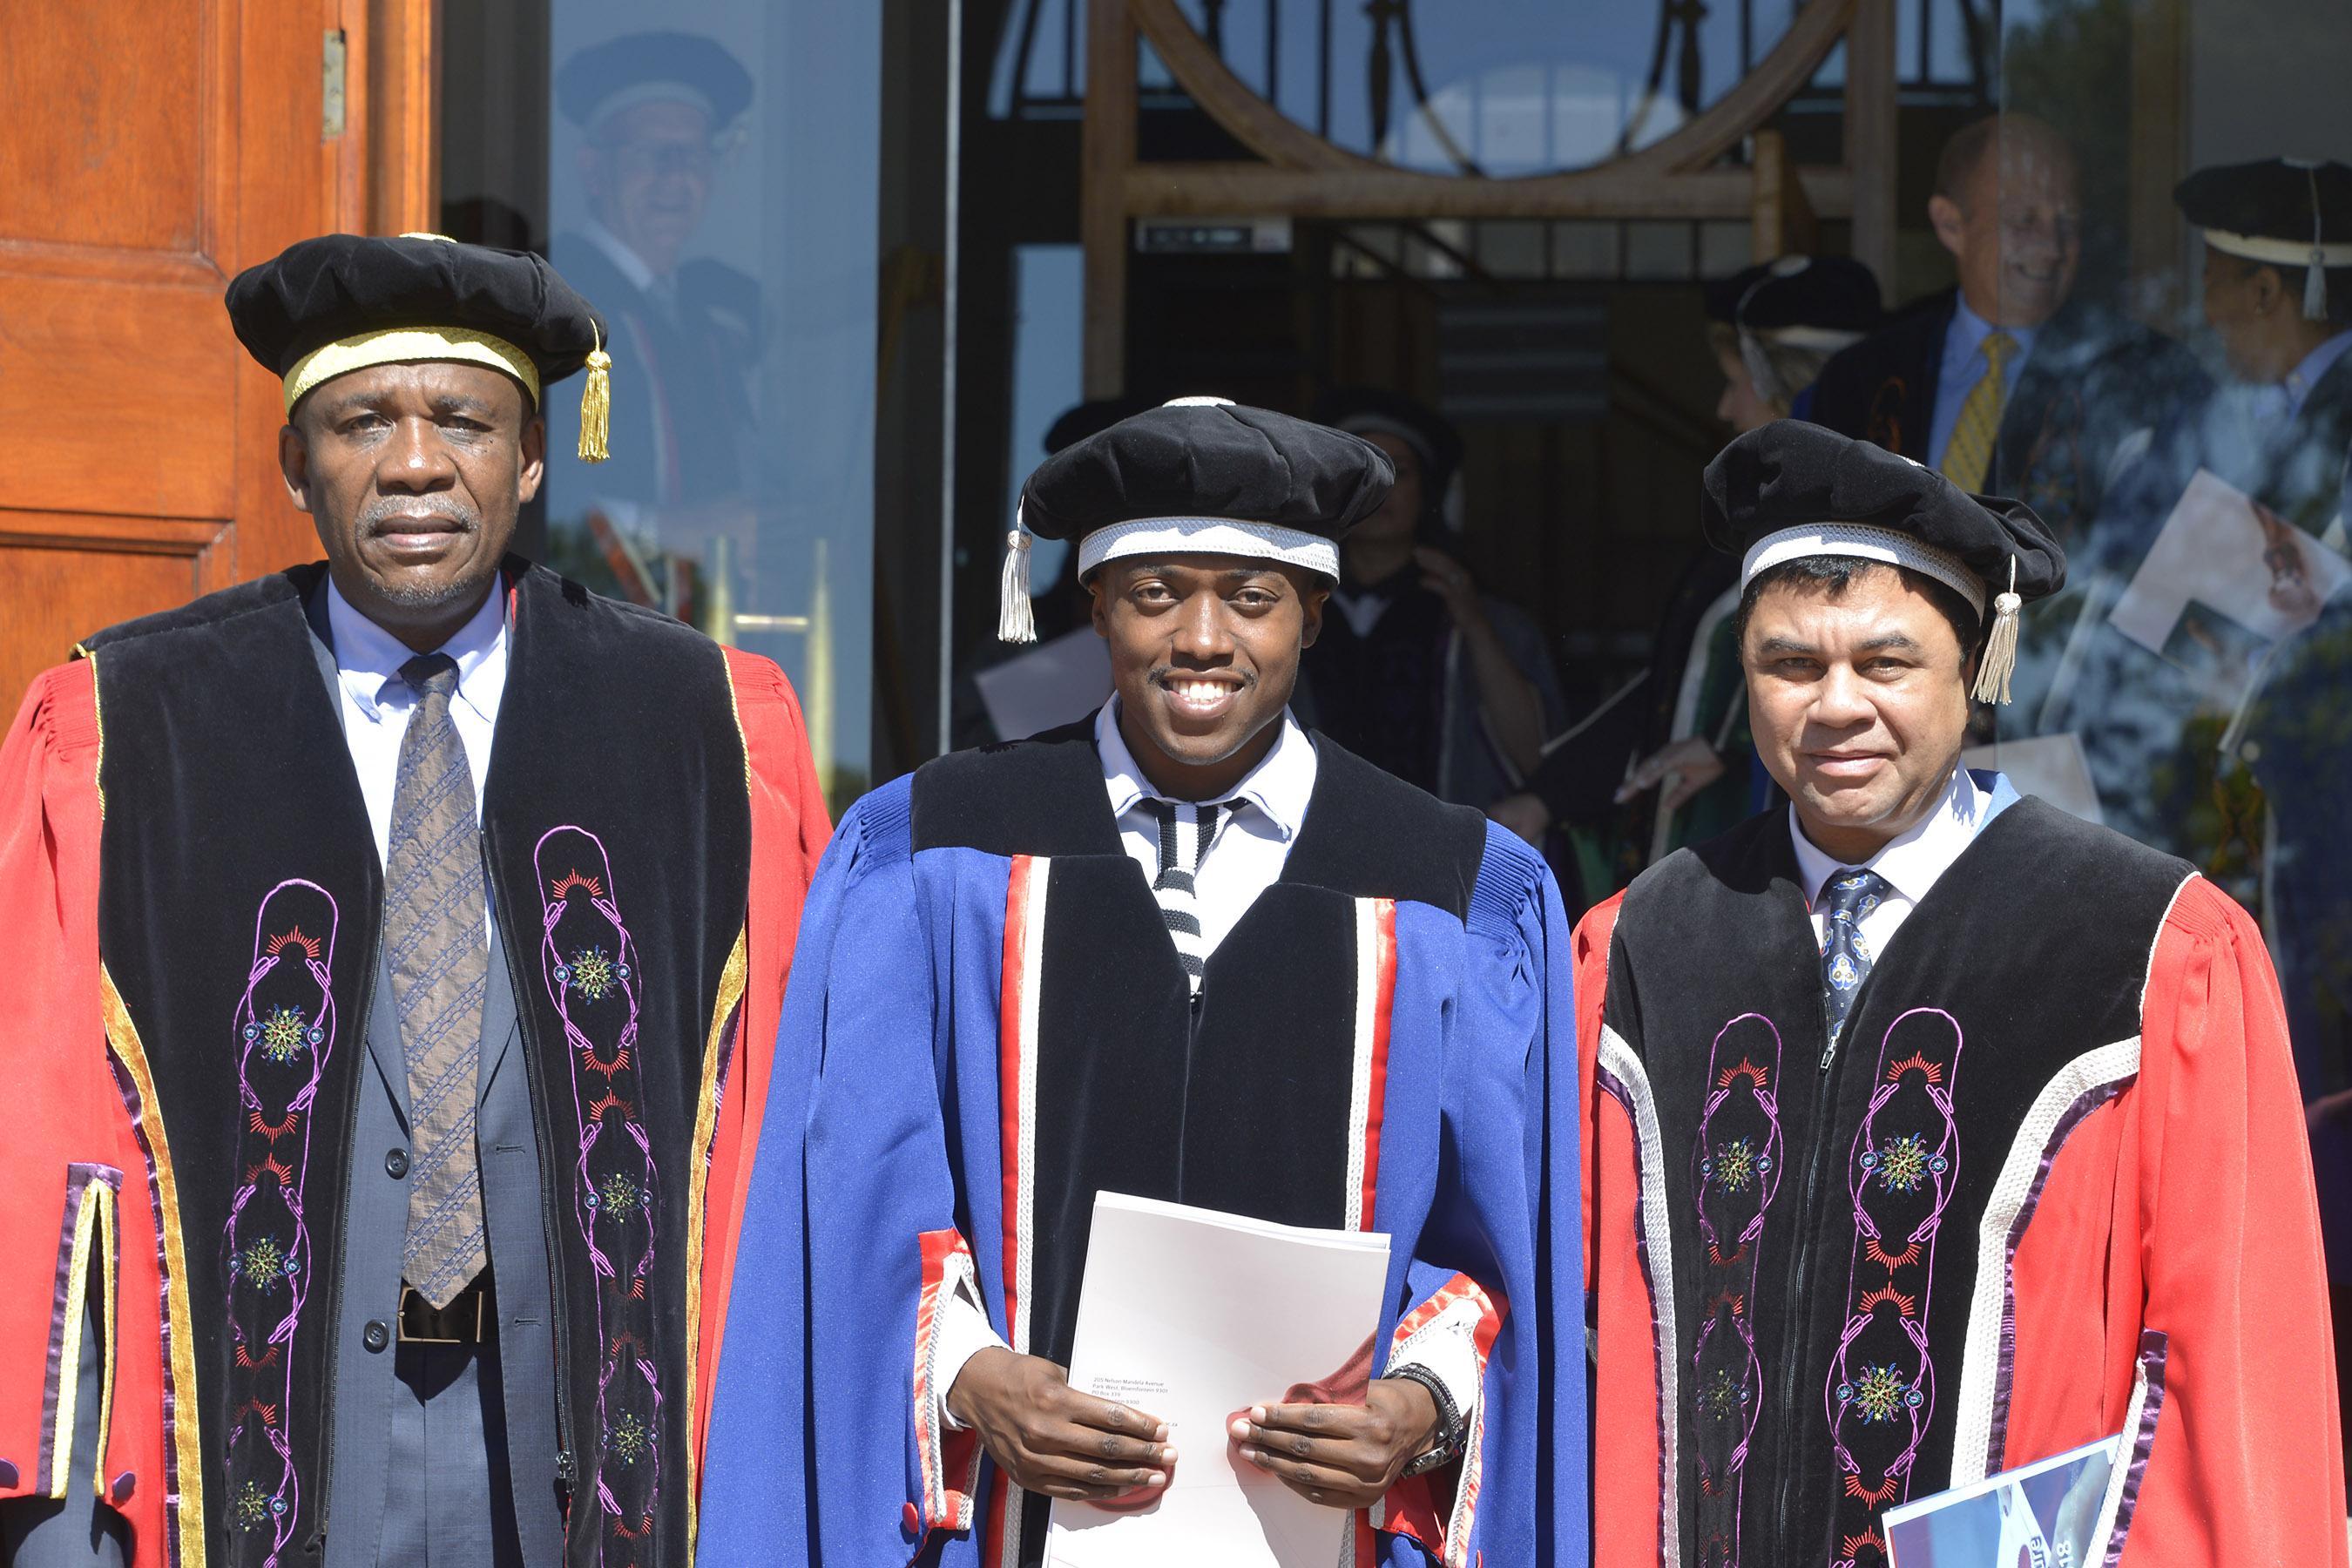 Dr Khosto Mokhele, UFS Chancellor, Ace Moloi and Prof Francis Petersen, UFS Rector and Vice-Chancellor